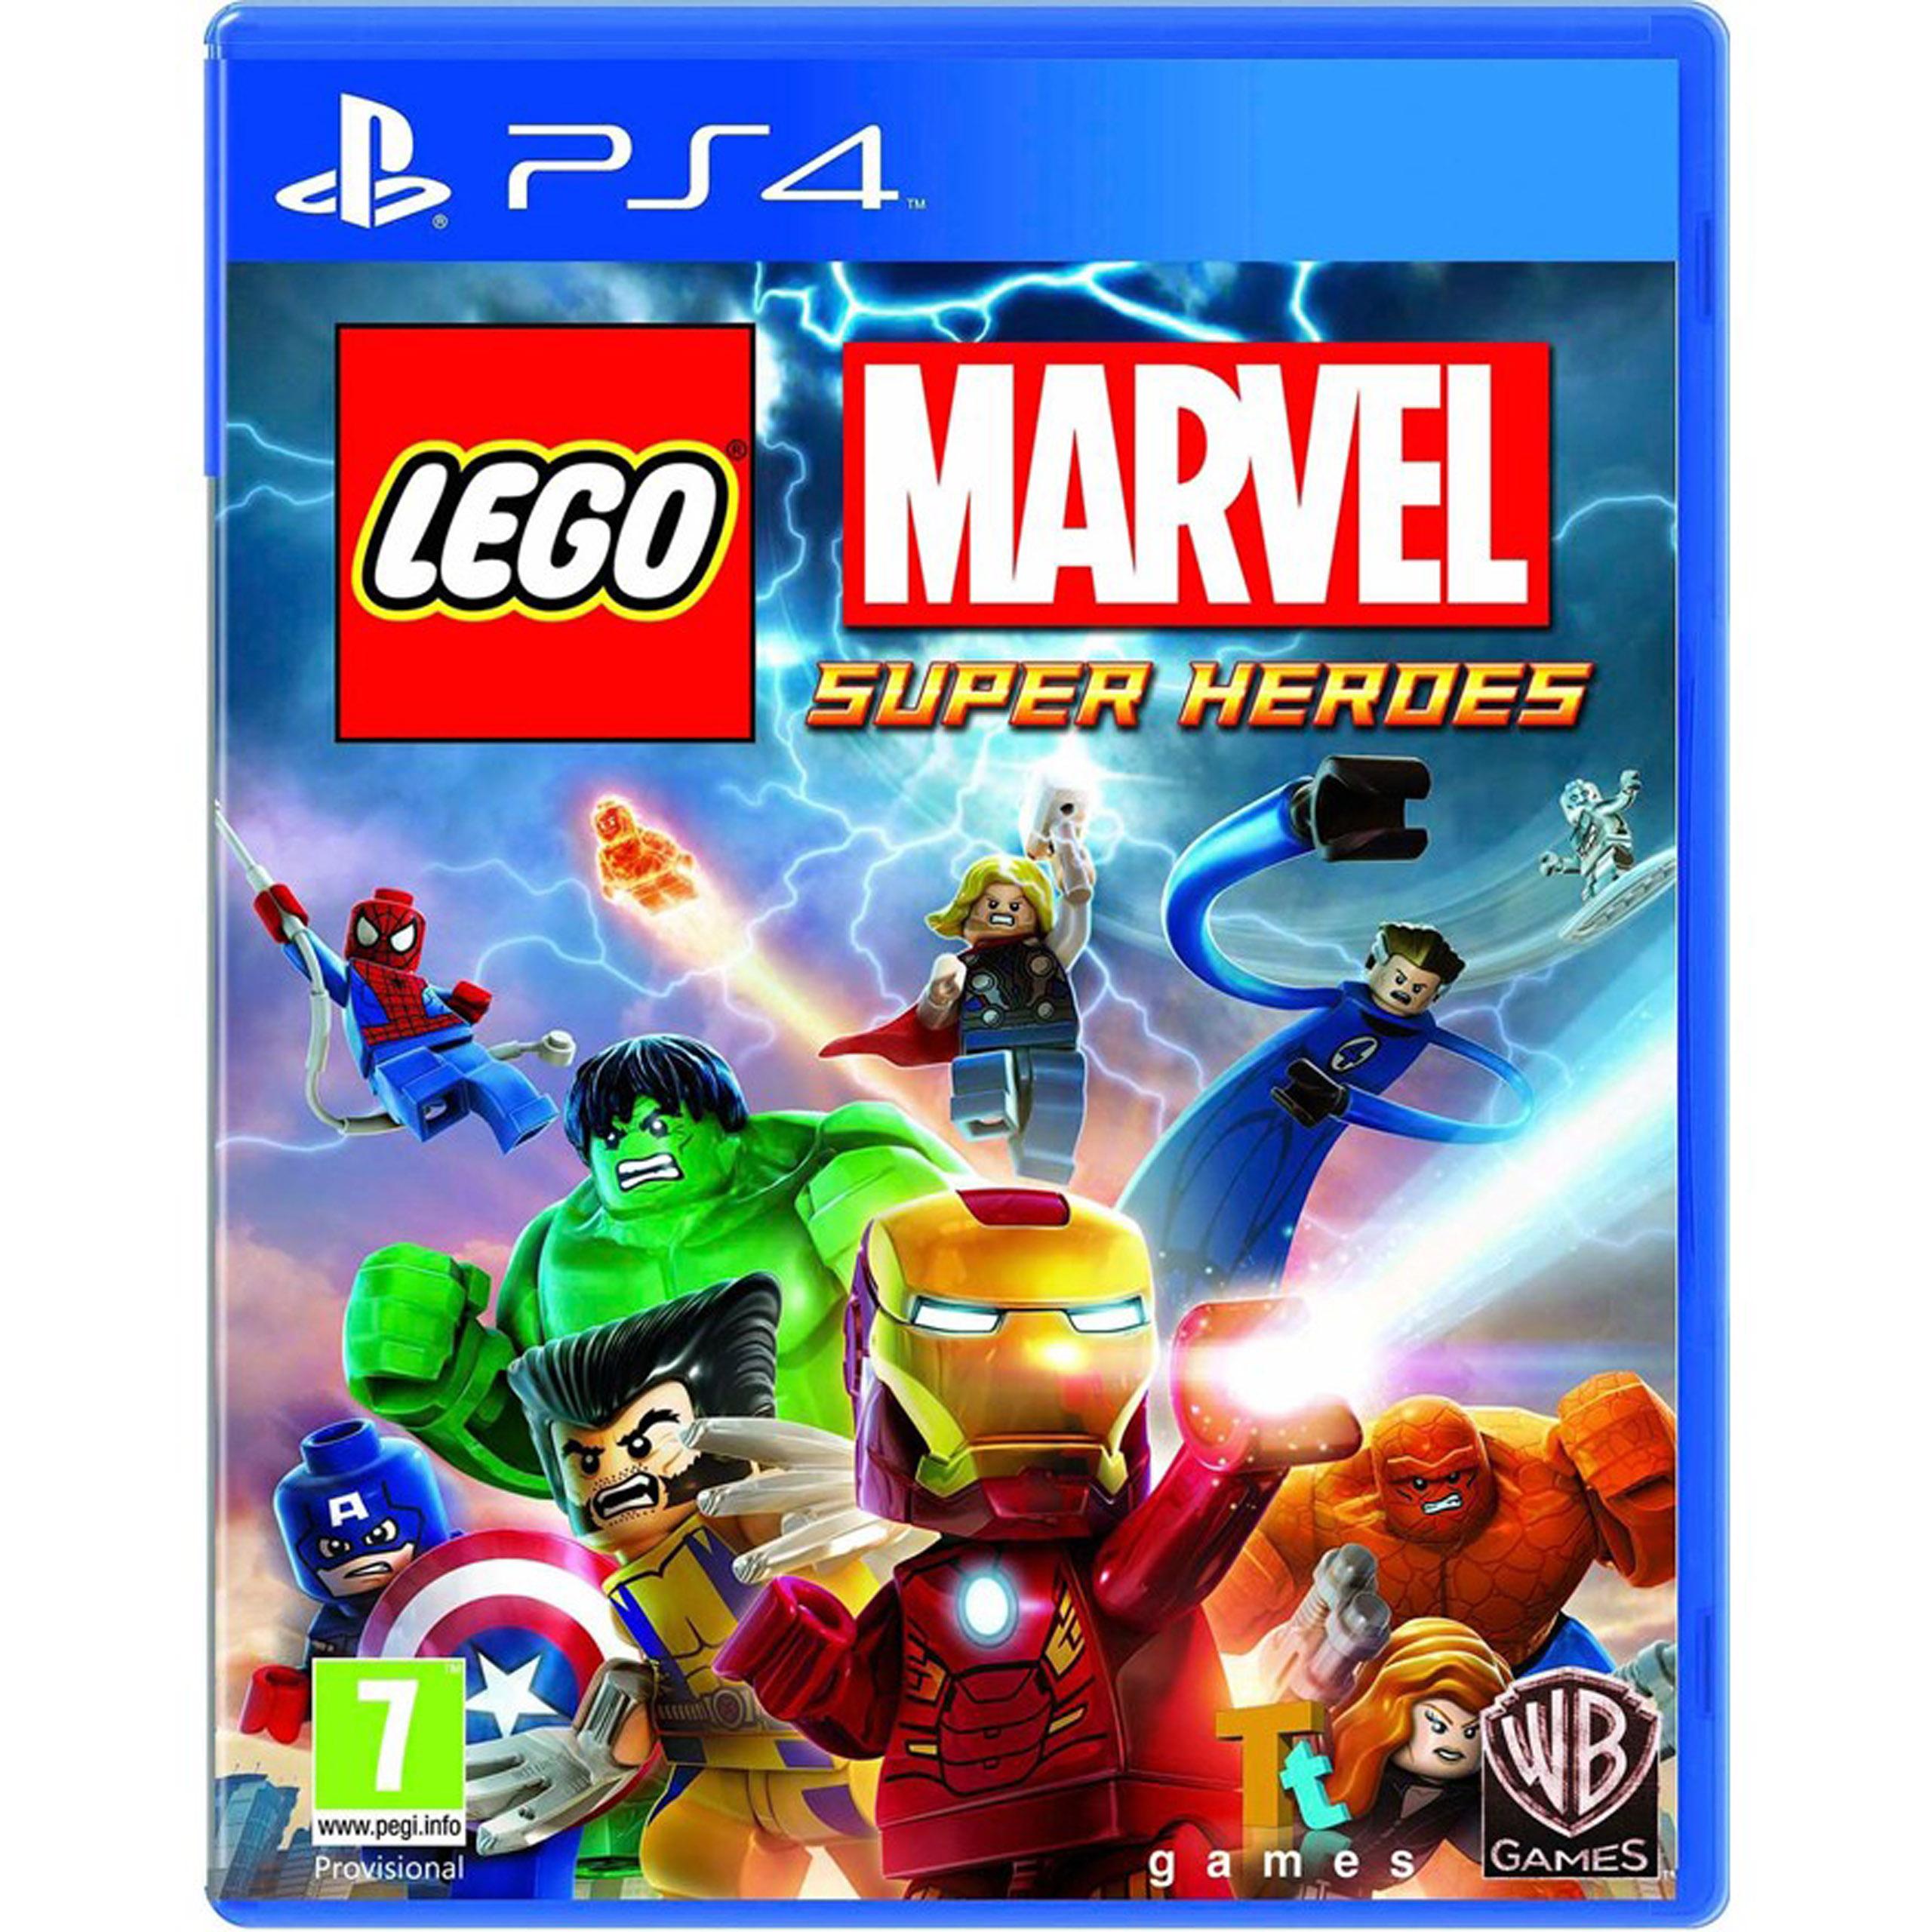 aada0d9e5 LEGO MARVEL SUPER HEROES / PS4 / WARSZAWA SKLEP MP - 7021859247 ...